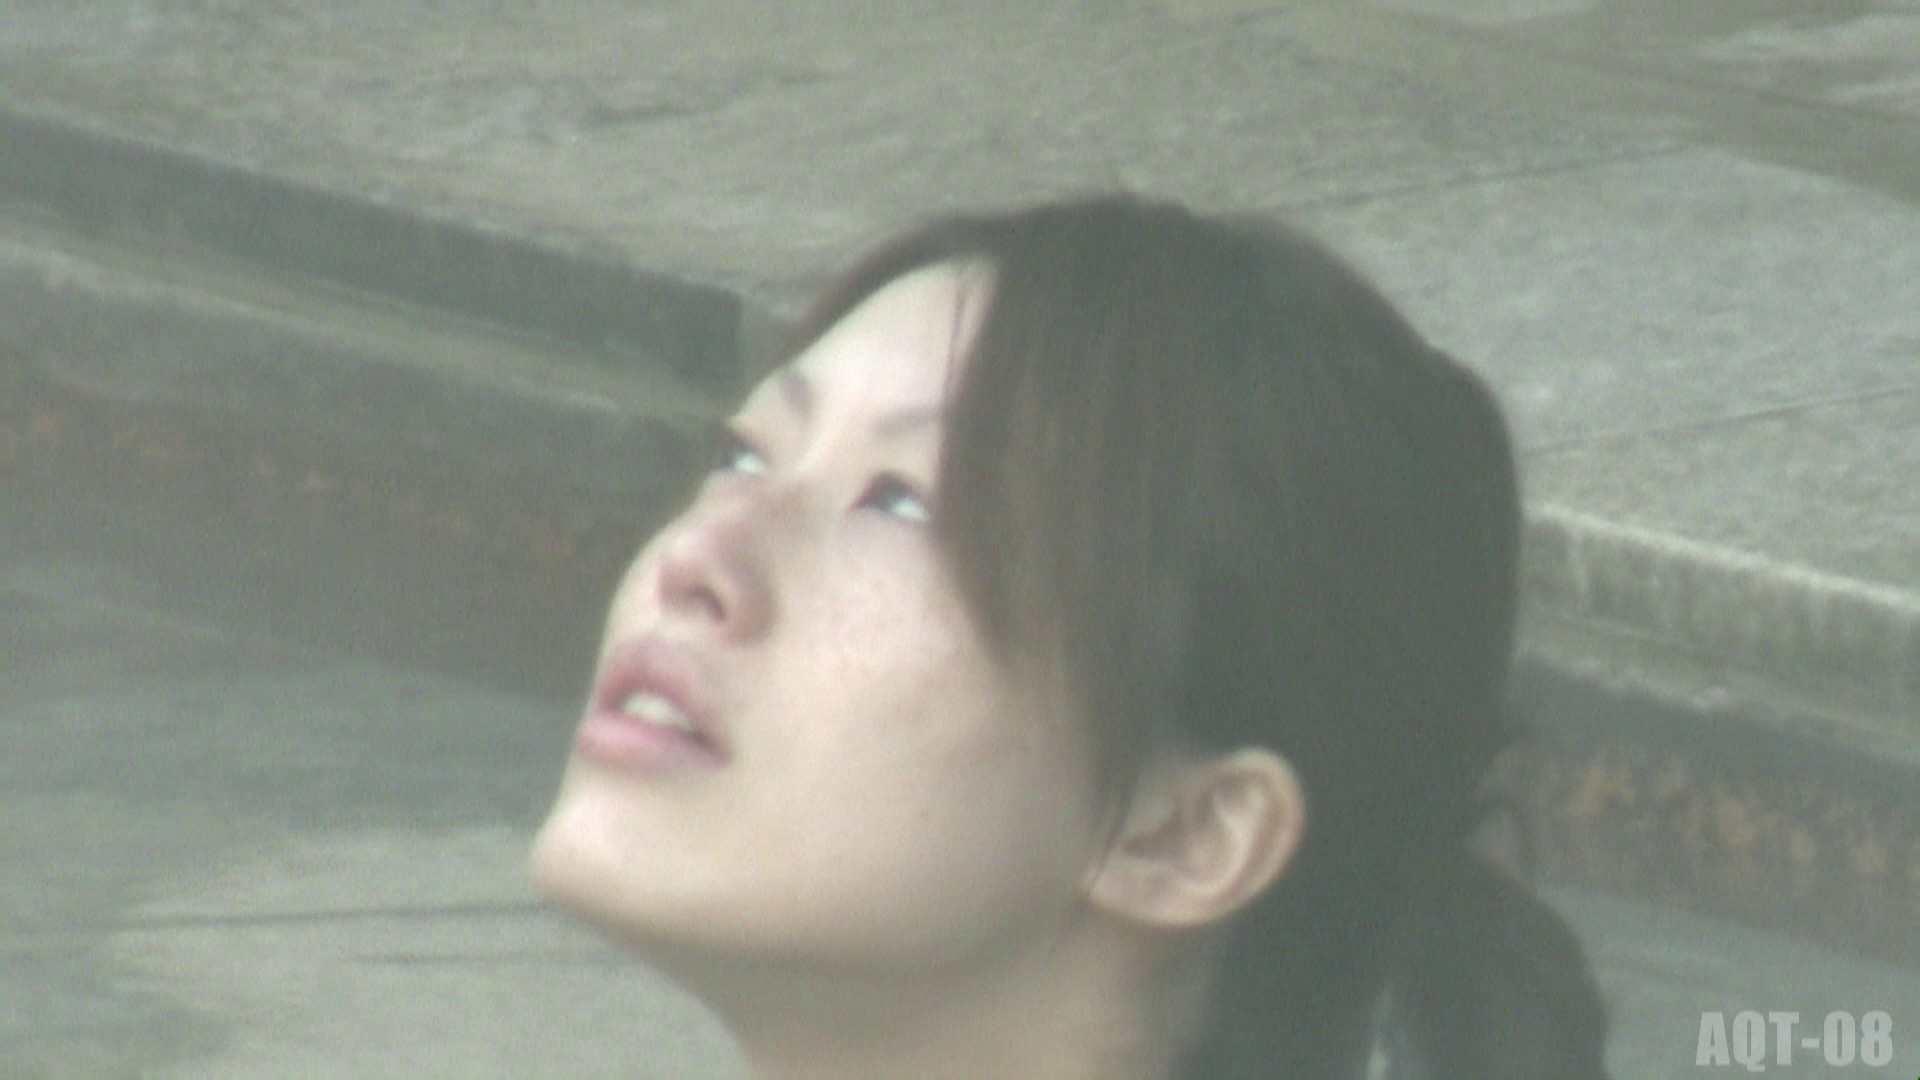 Aquaな露天風呂Vol.775 盗撮映像  74Pix 28